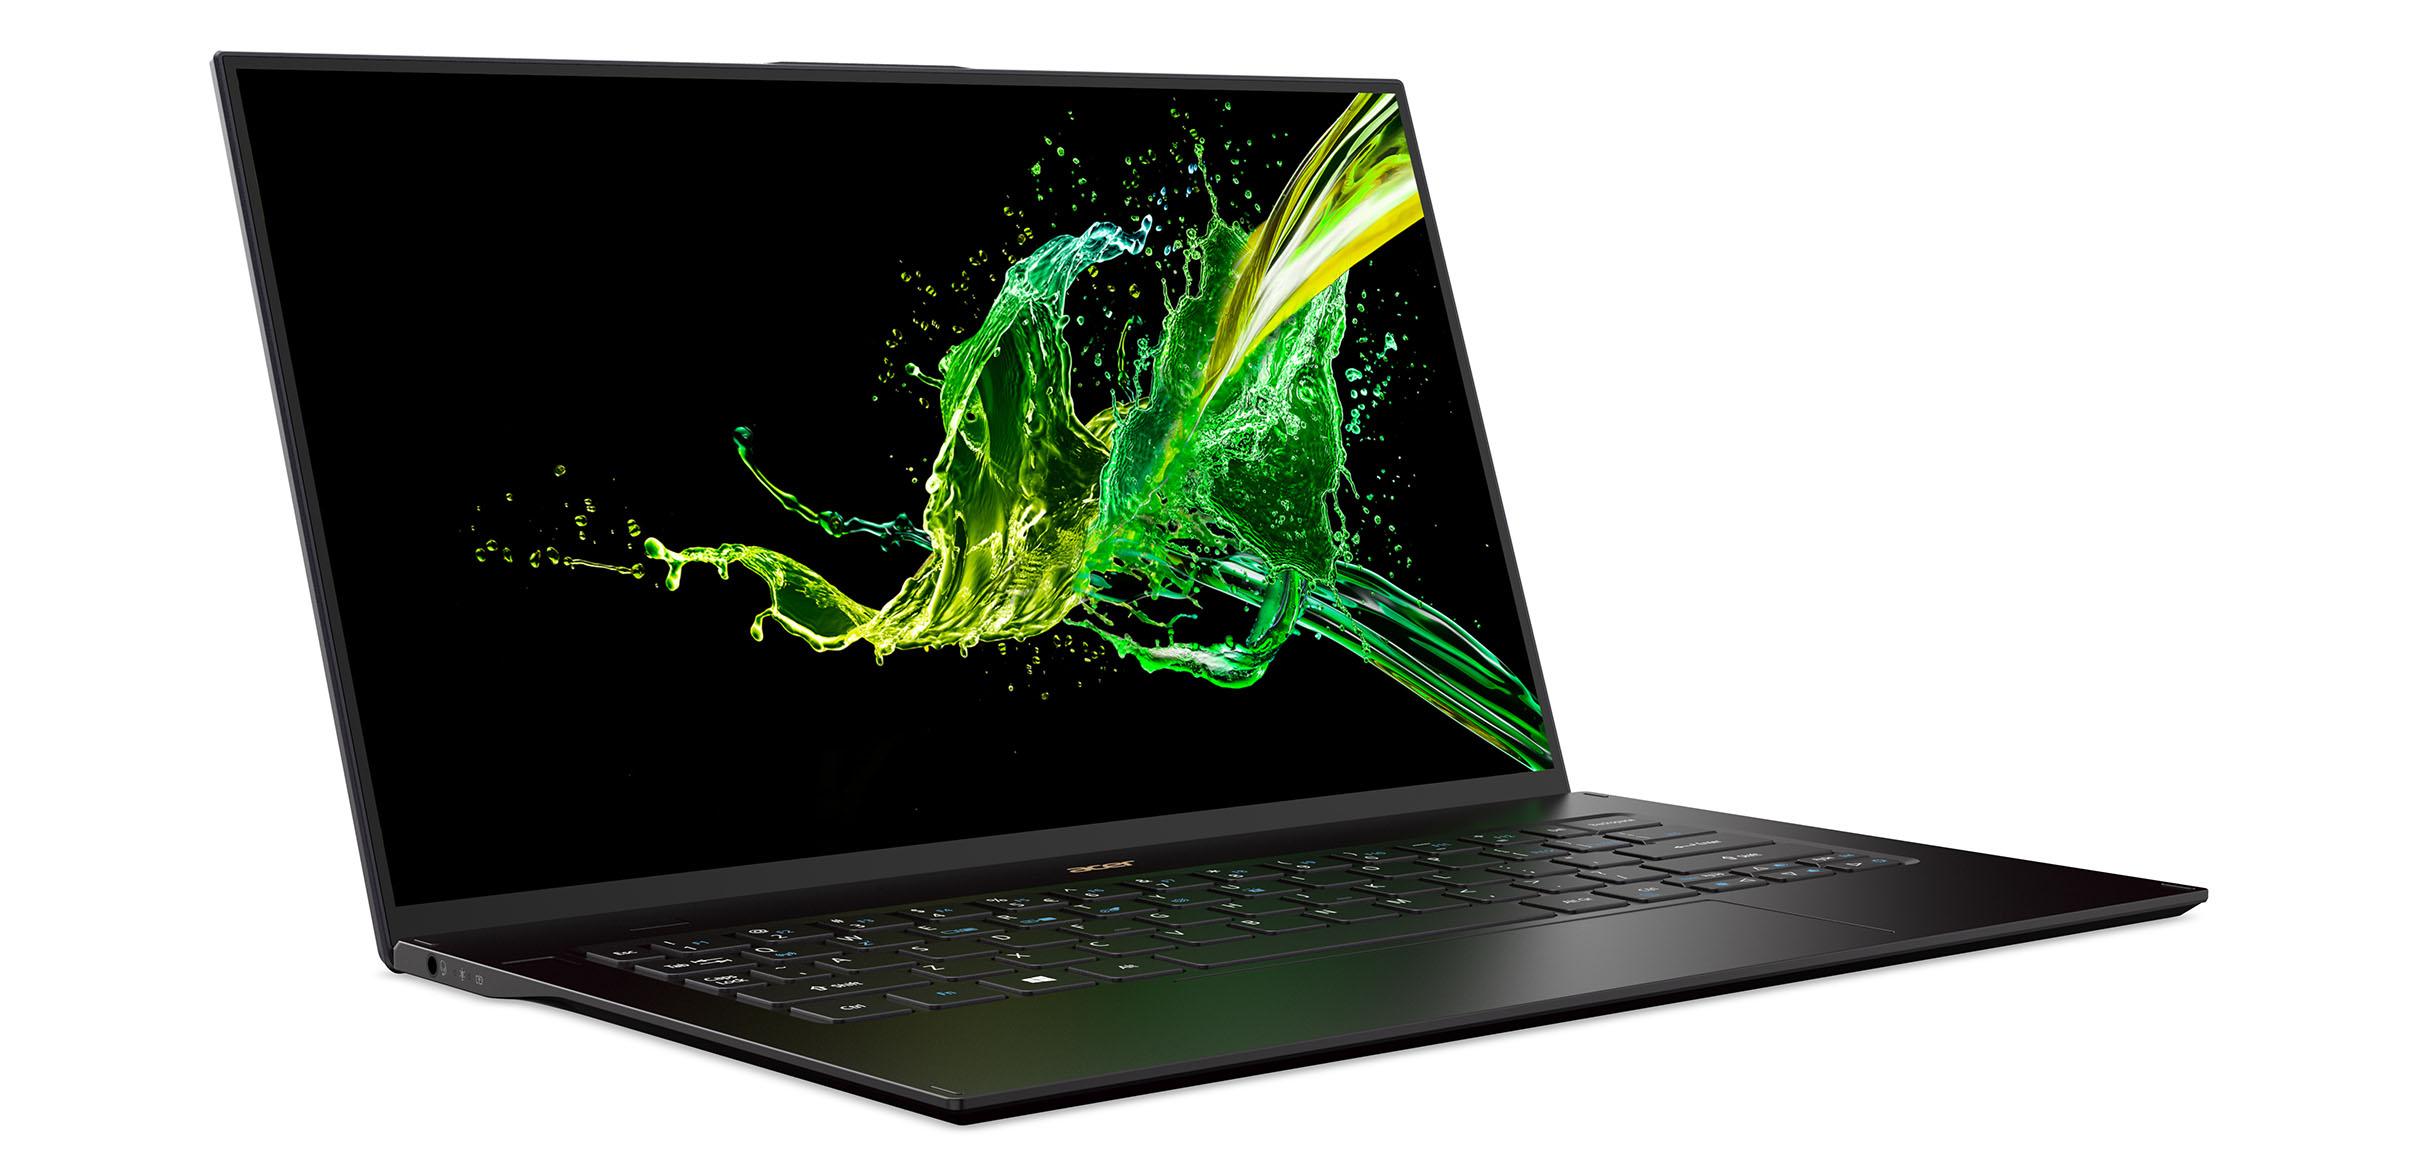 Laptop Acer Swift 7 (SF714-52T)